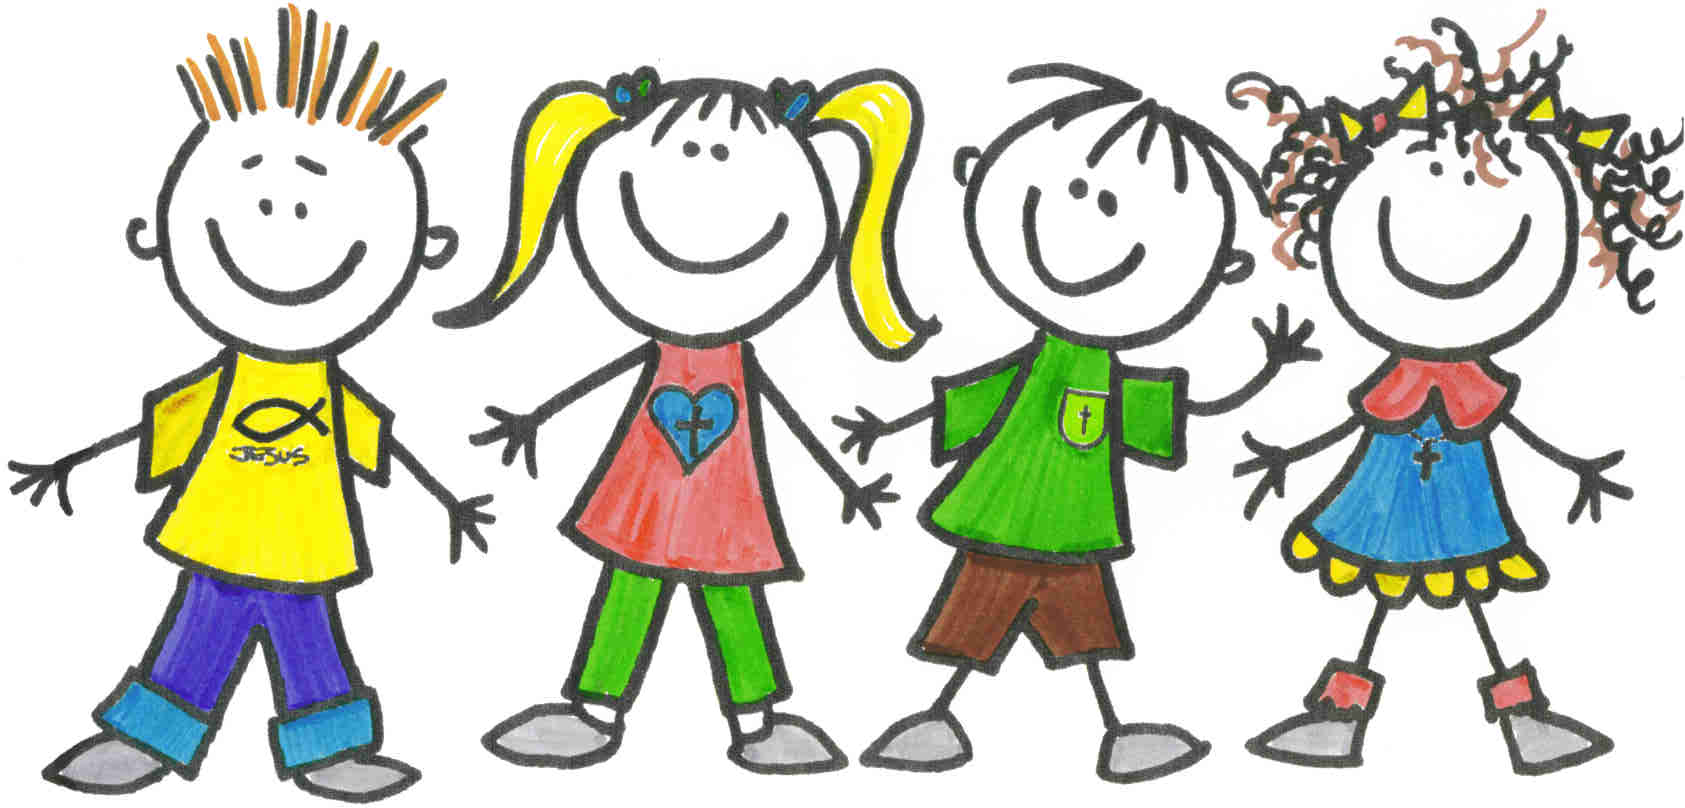 hight resolution of preschool children s speech and language development 2 to 6 years